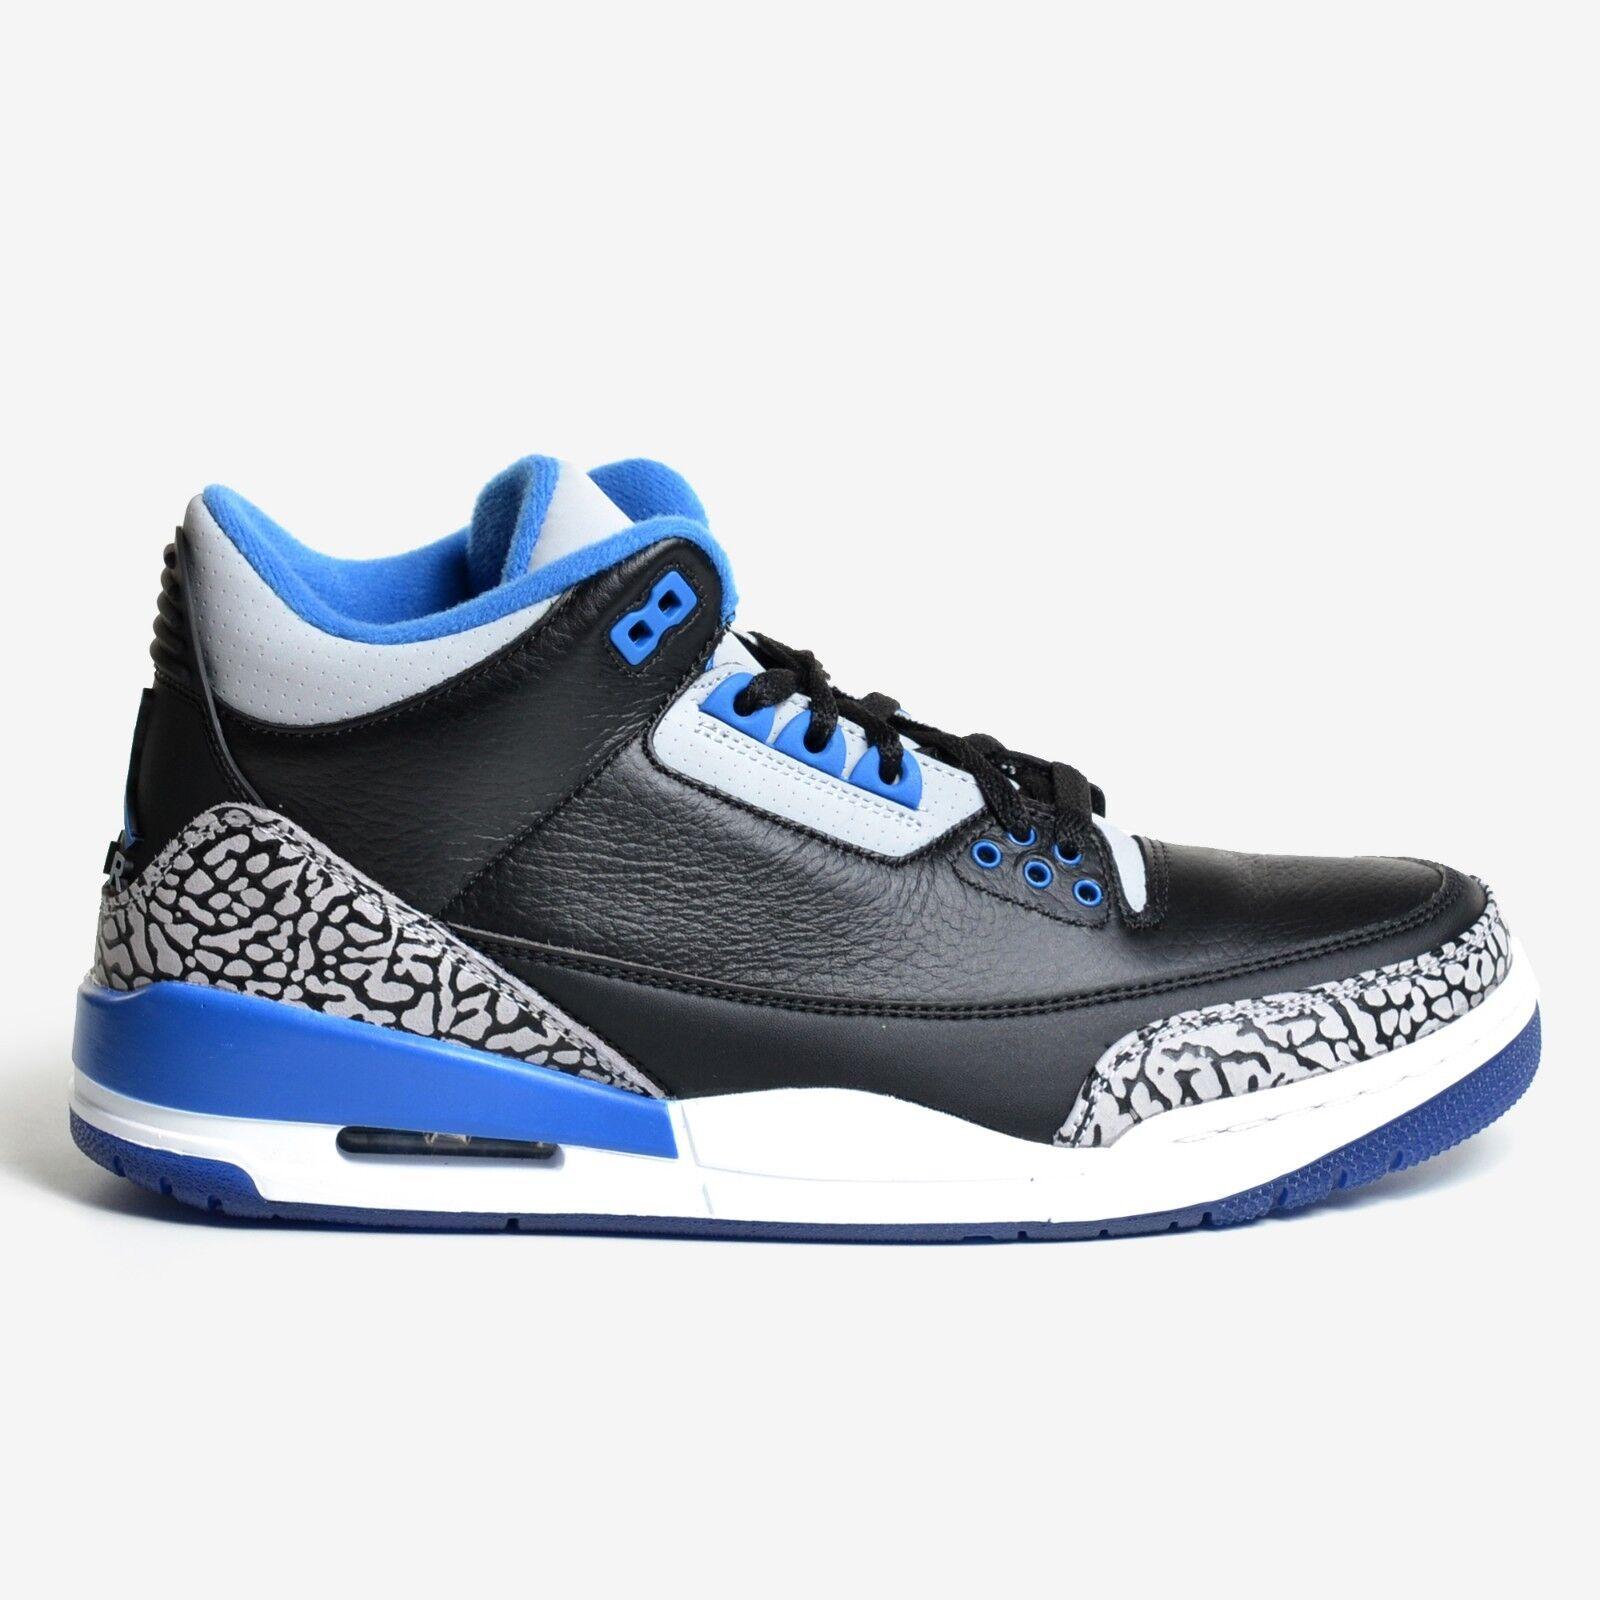 5bb4167f5a4 Air Jordan 3 Retro Black Sport Blue 2014 Grey White Men's III DS 136064-007